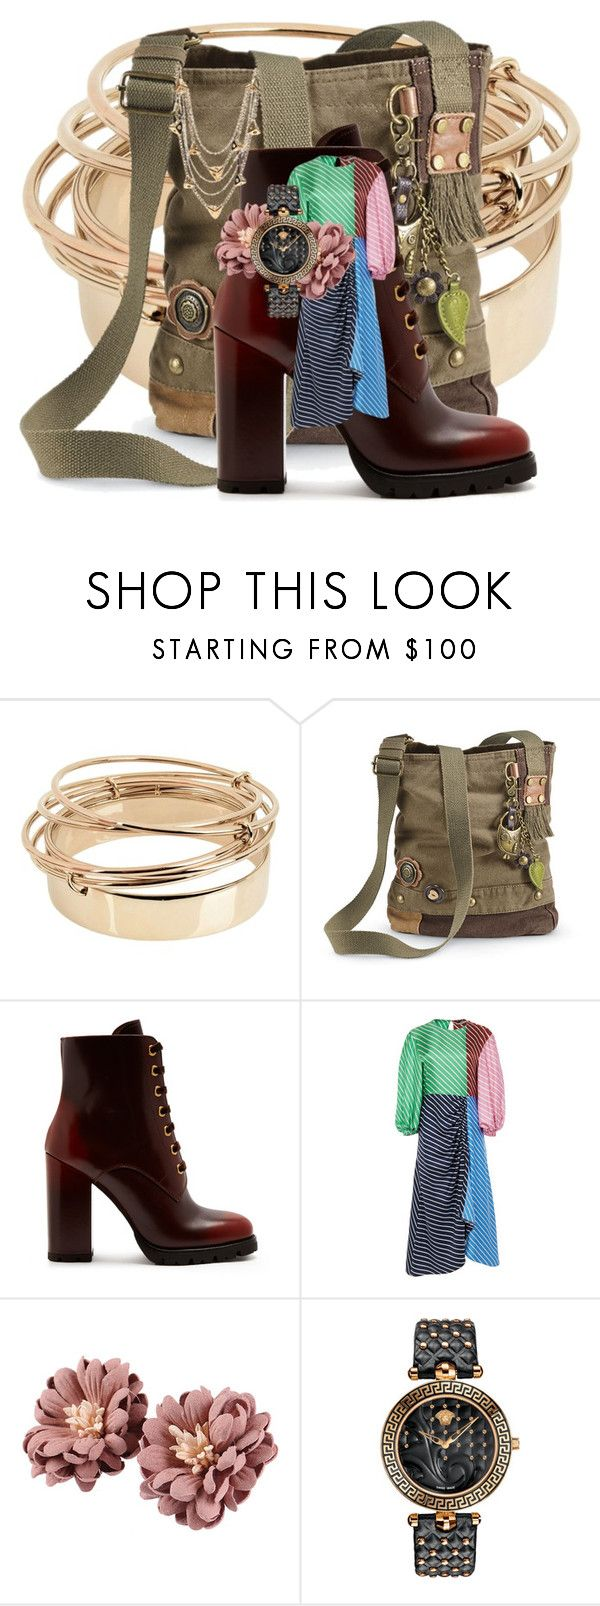 Gold bracelet u great boots for boho colorful stripes versace